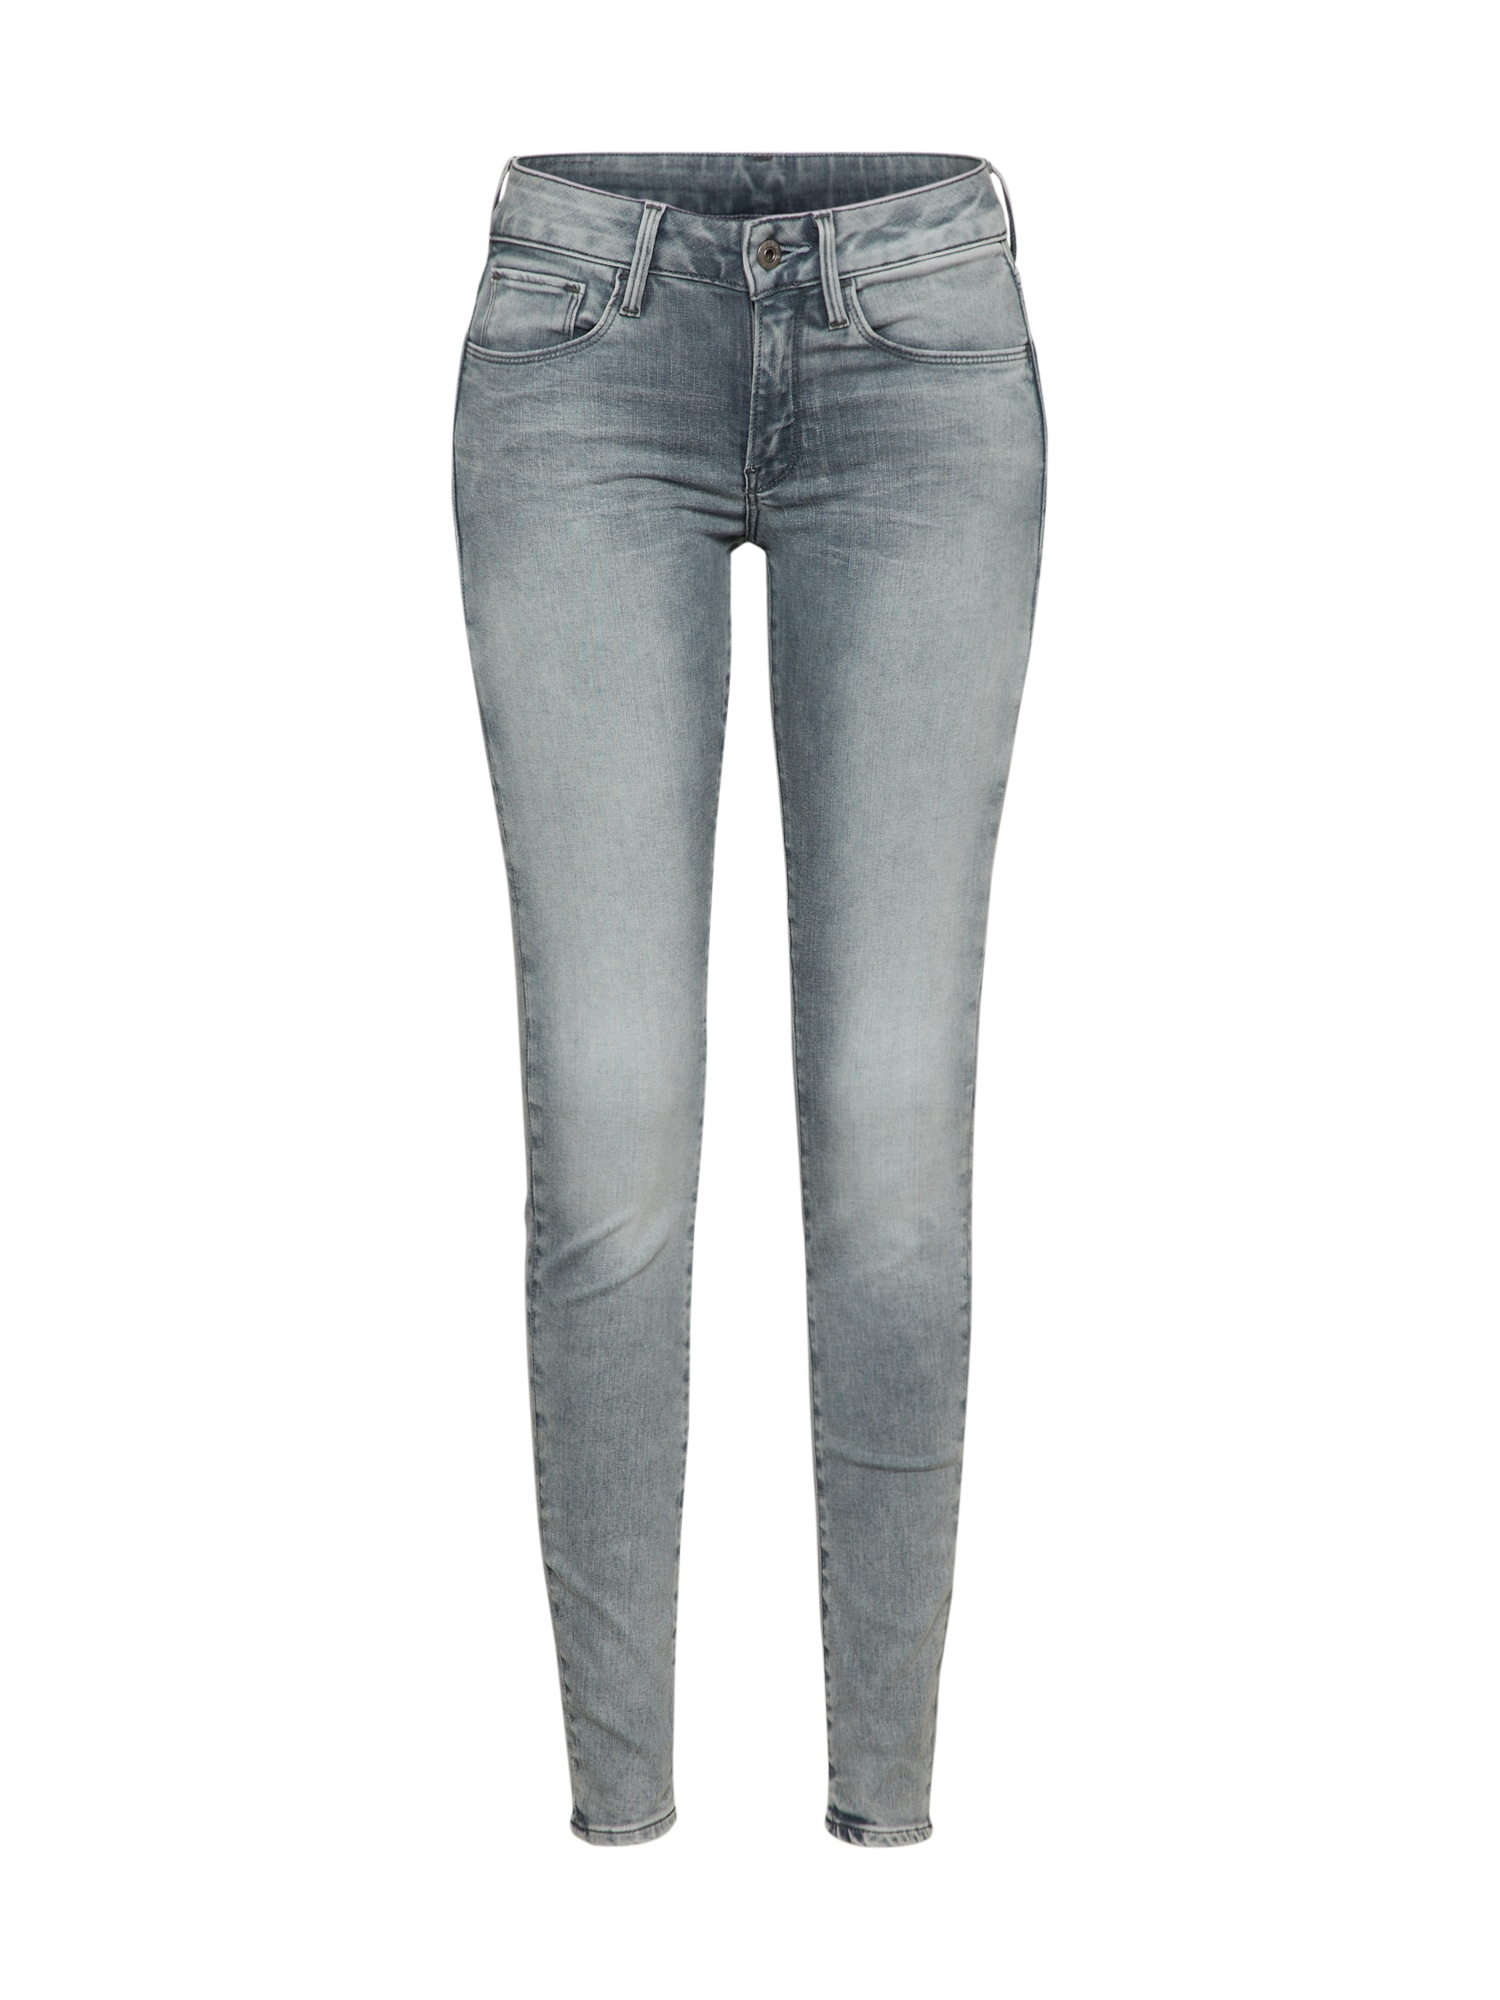 G-STAR RAW Dames Jeans grijs